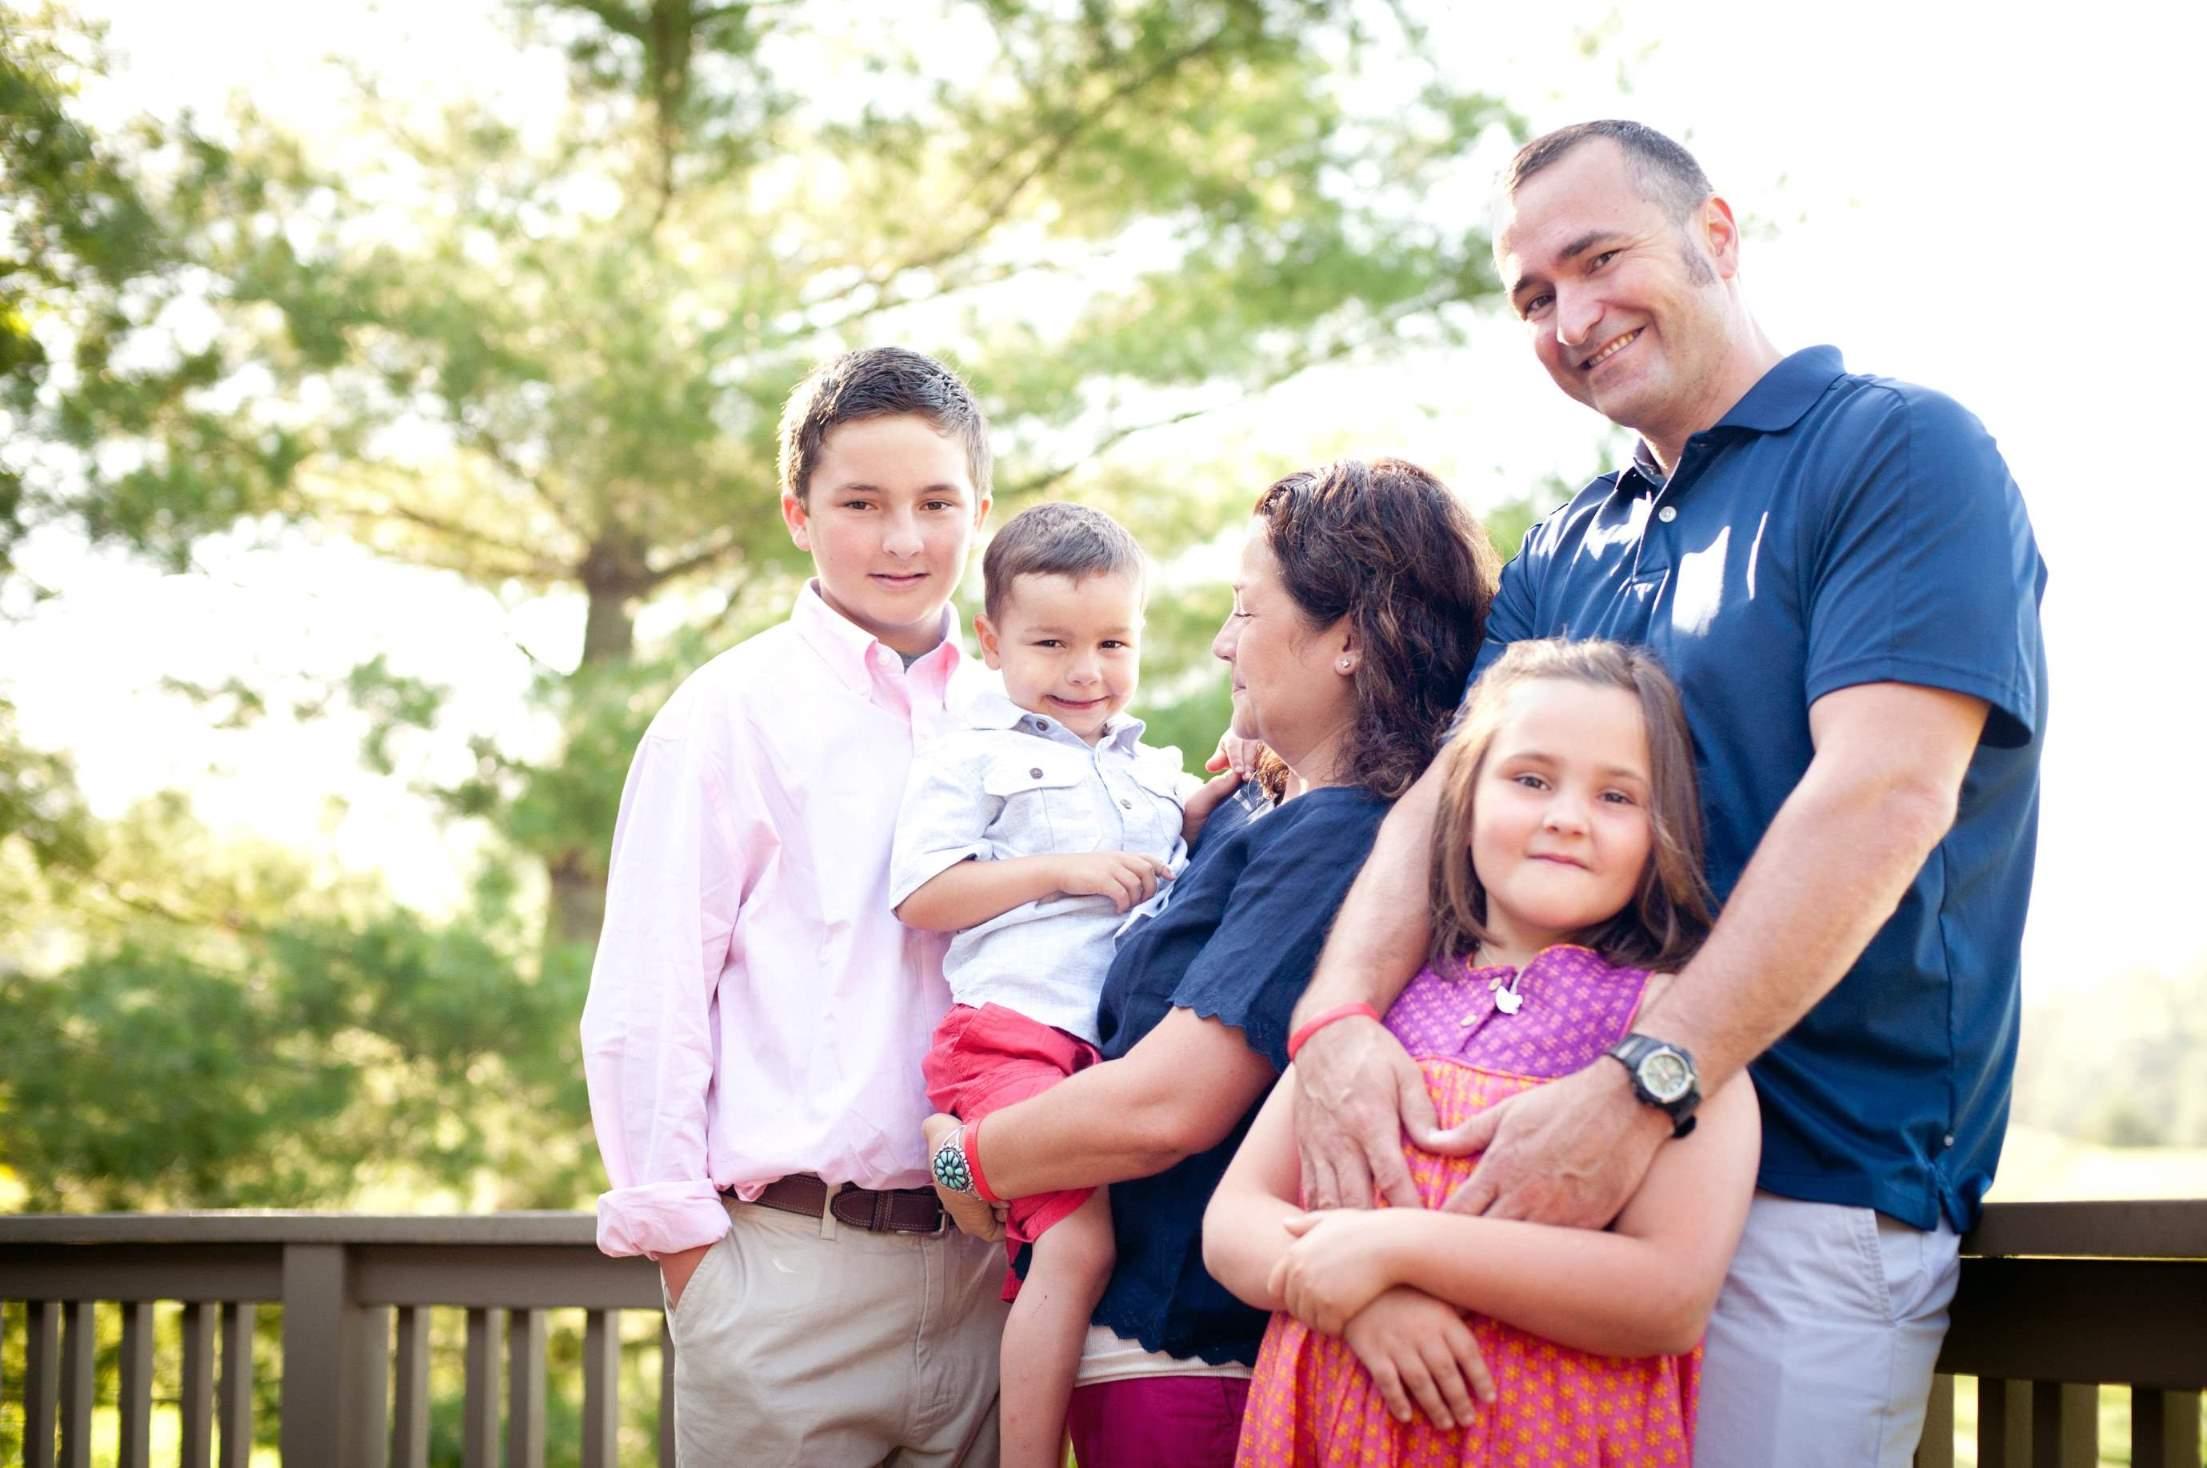 Chisholm family